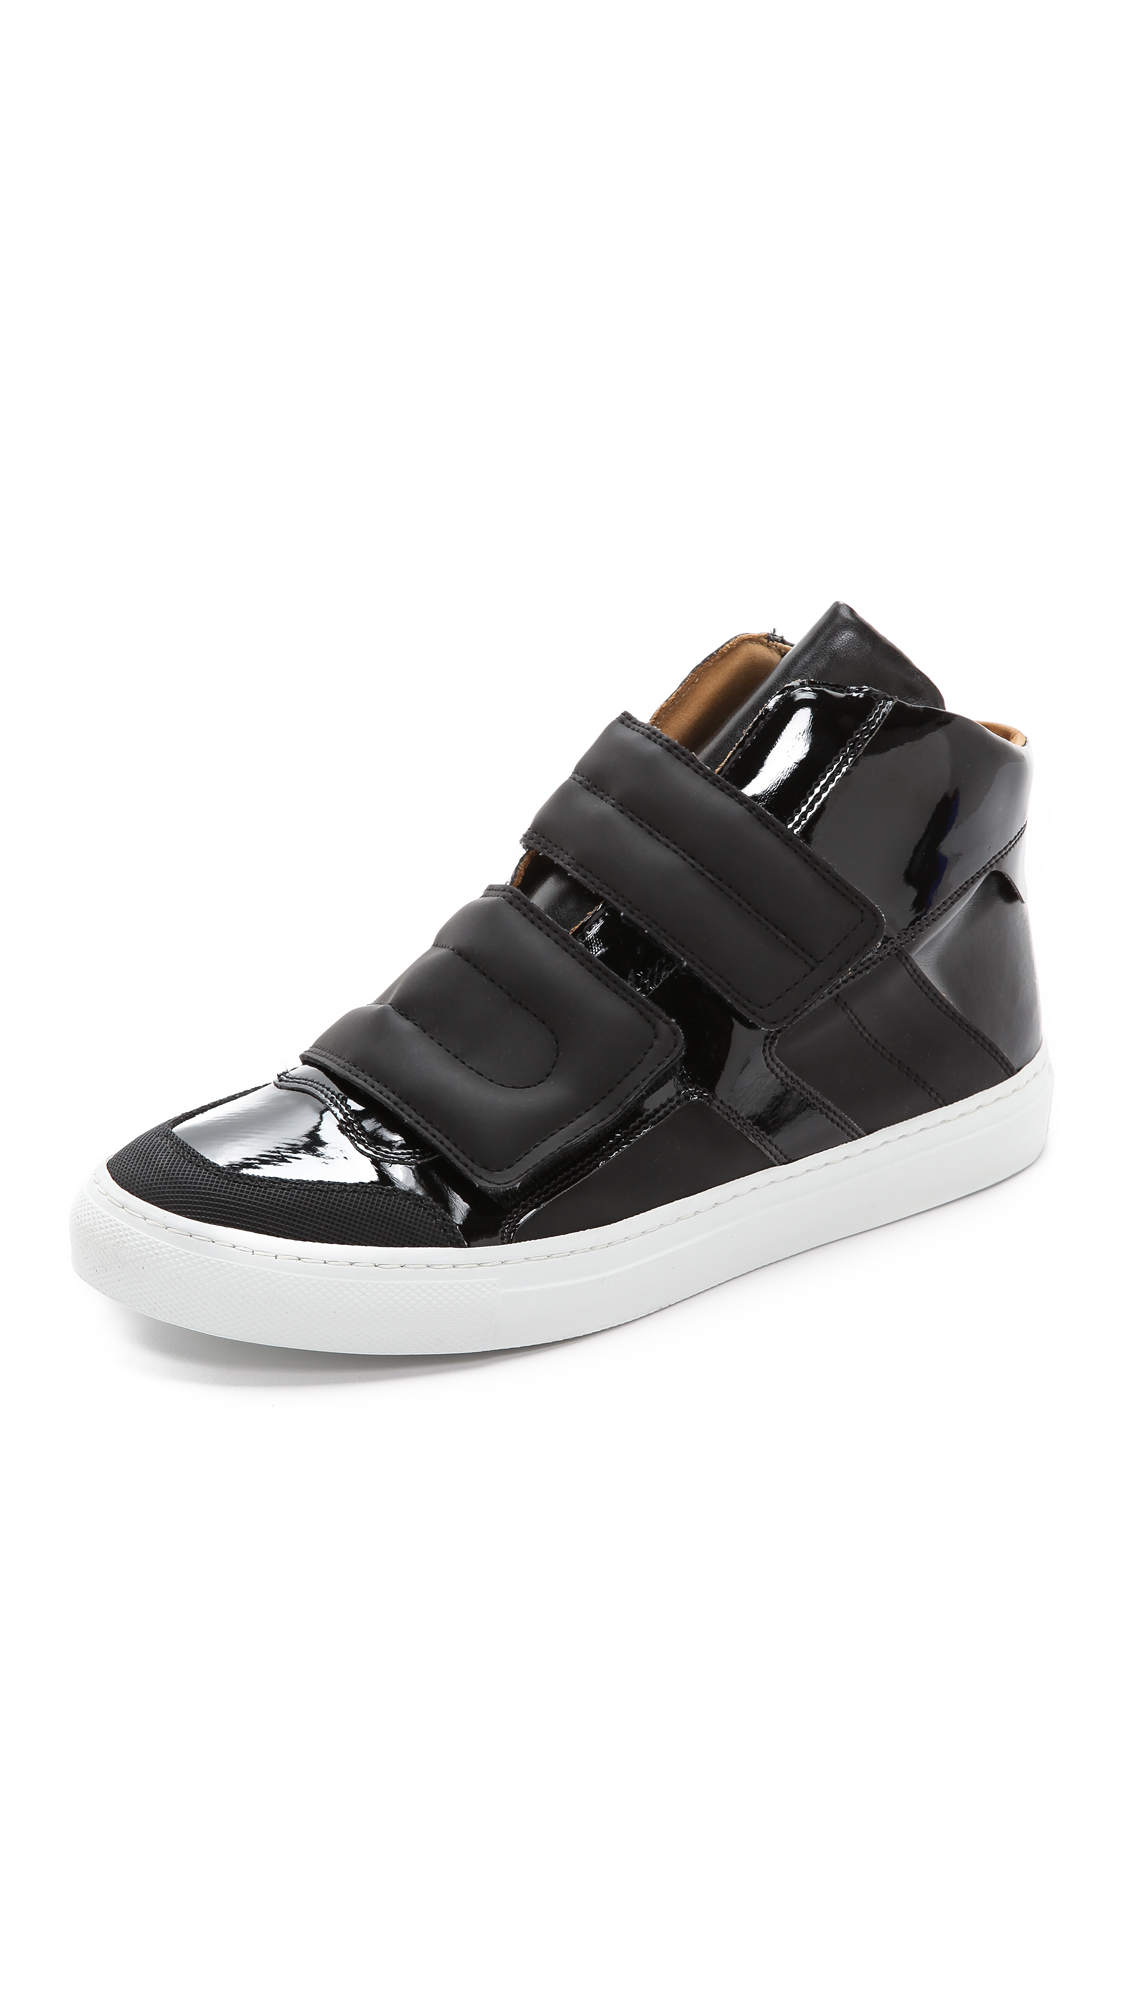 Mm6 by maison martin margiela high top velcro sneakers for Mm6 maison martin margiela